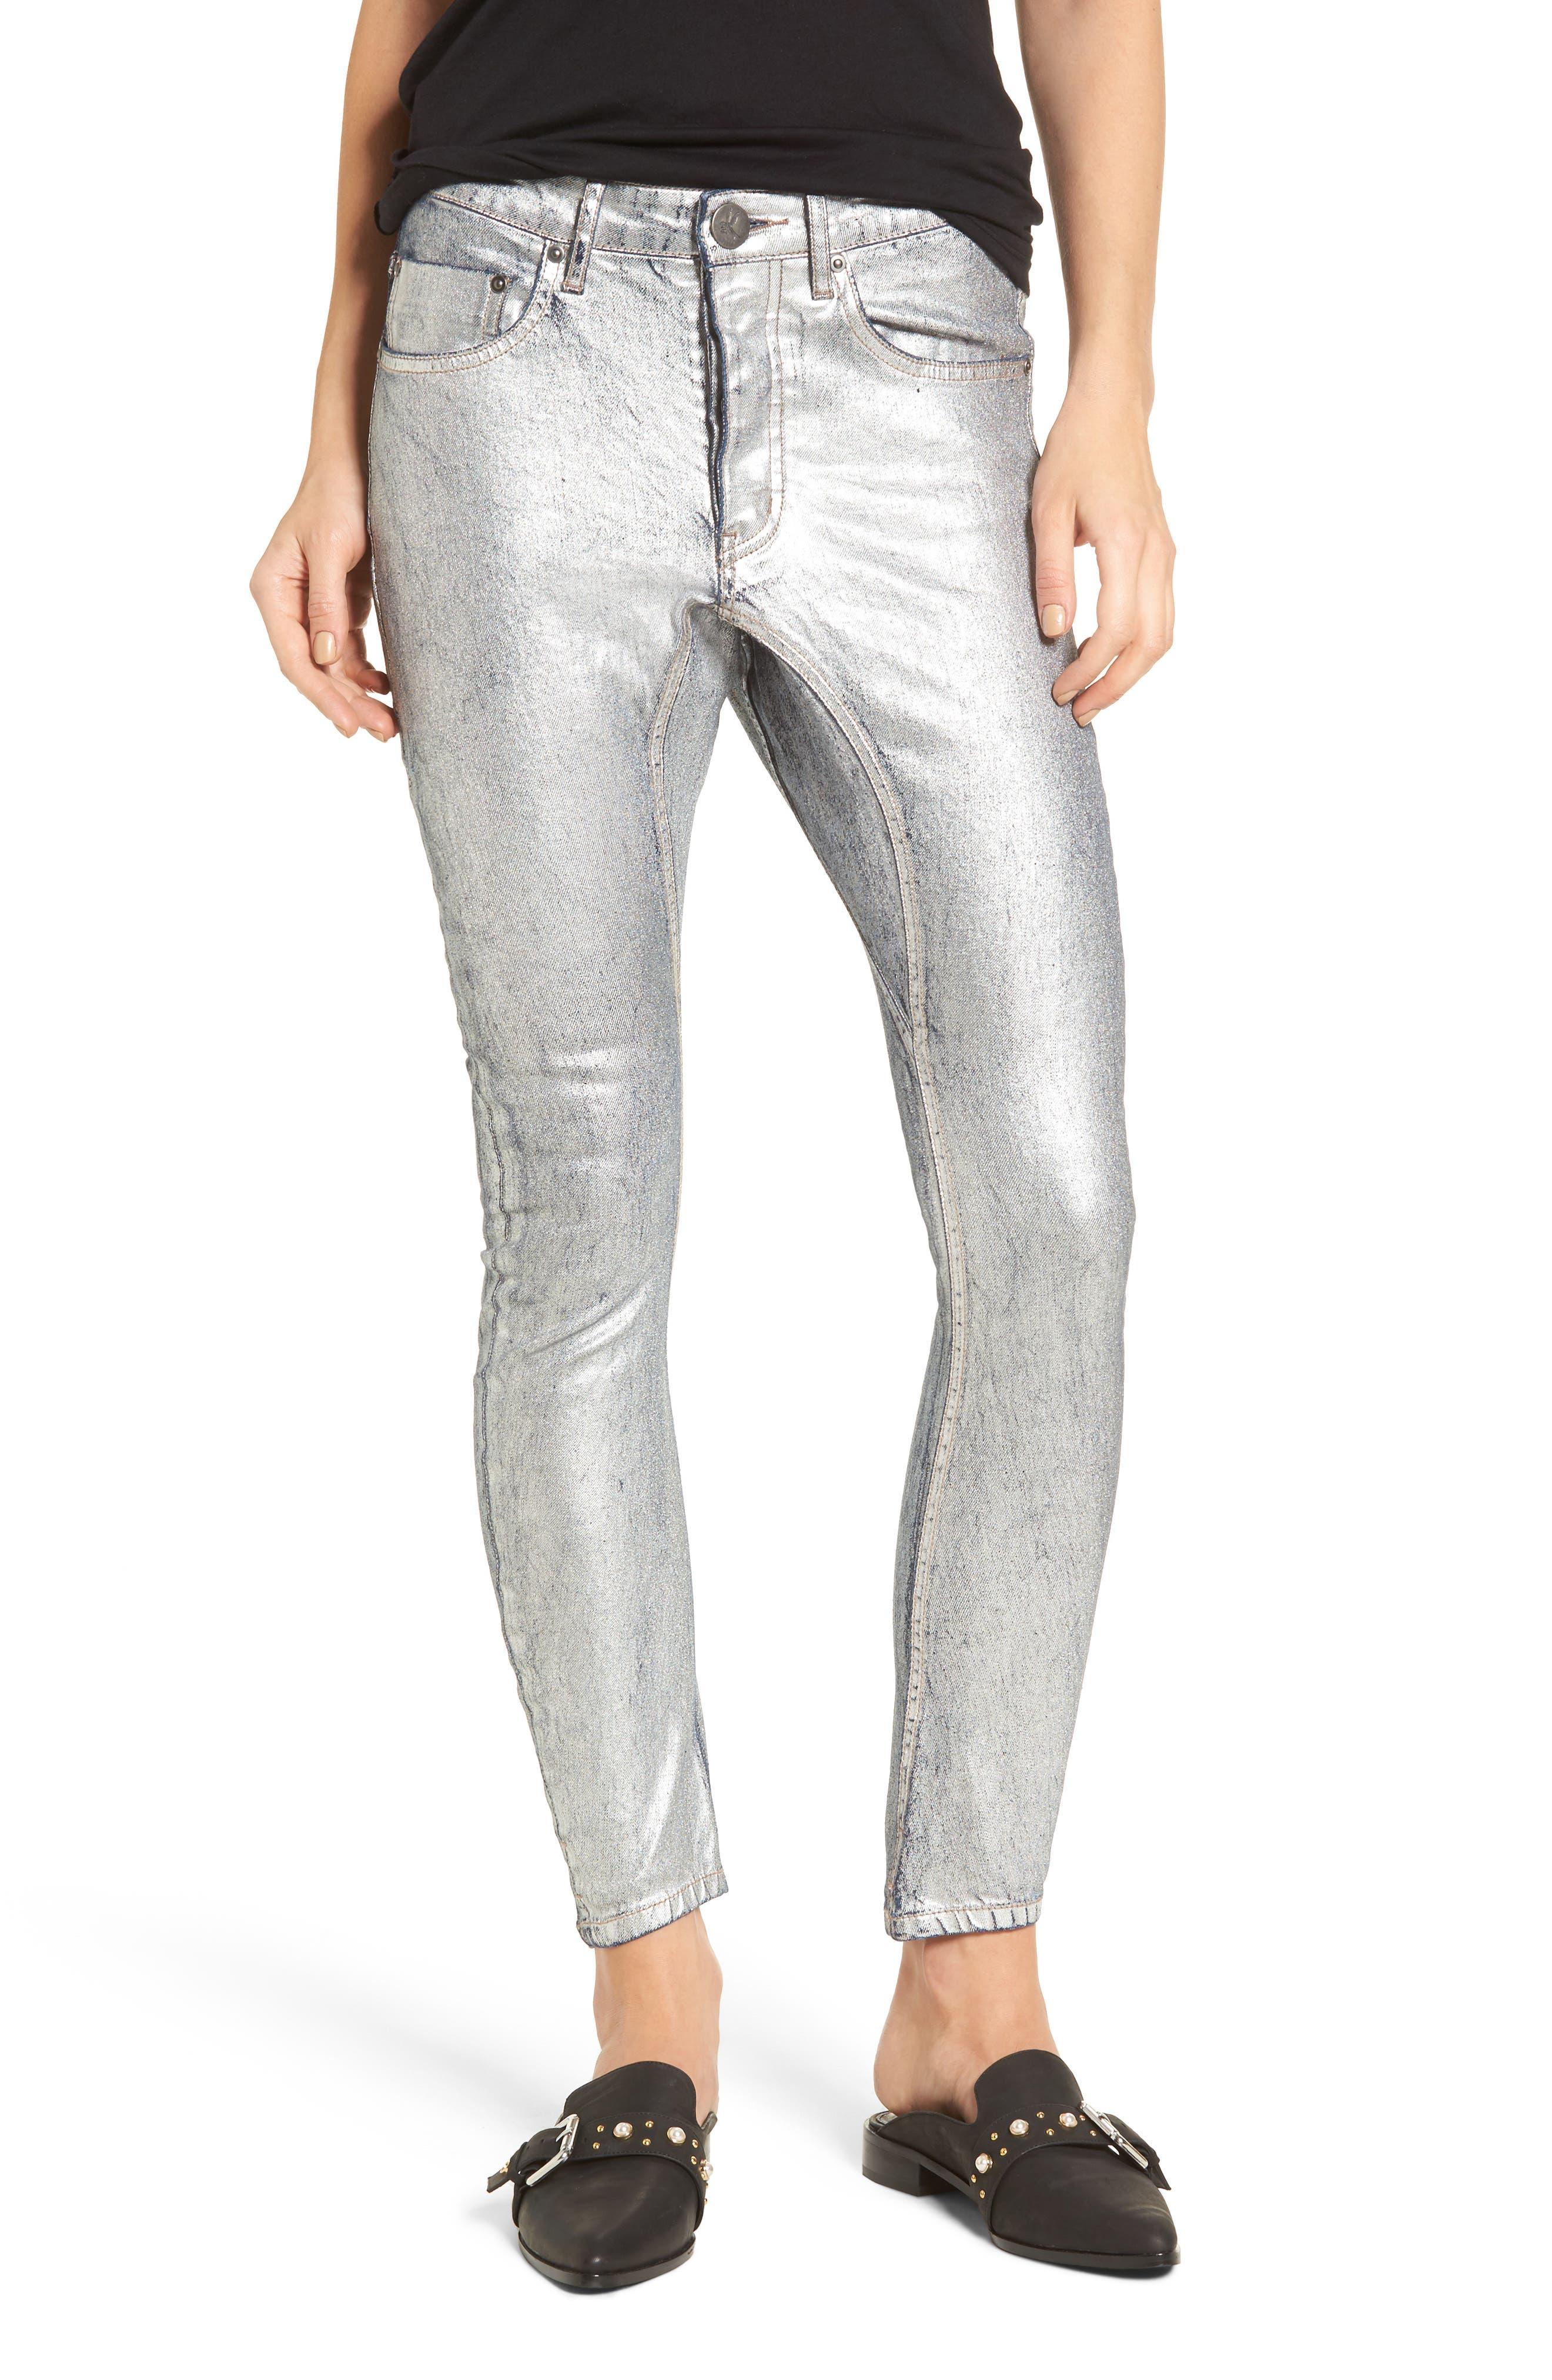 Kidds Metallic Drop Crotch Skinny Jeans,                         Main,                         color, Nightshade